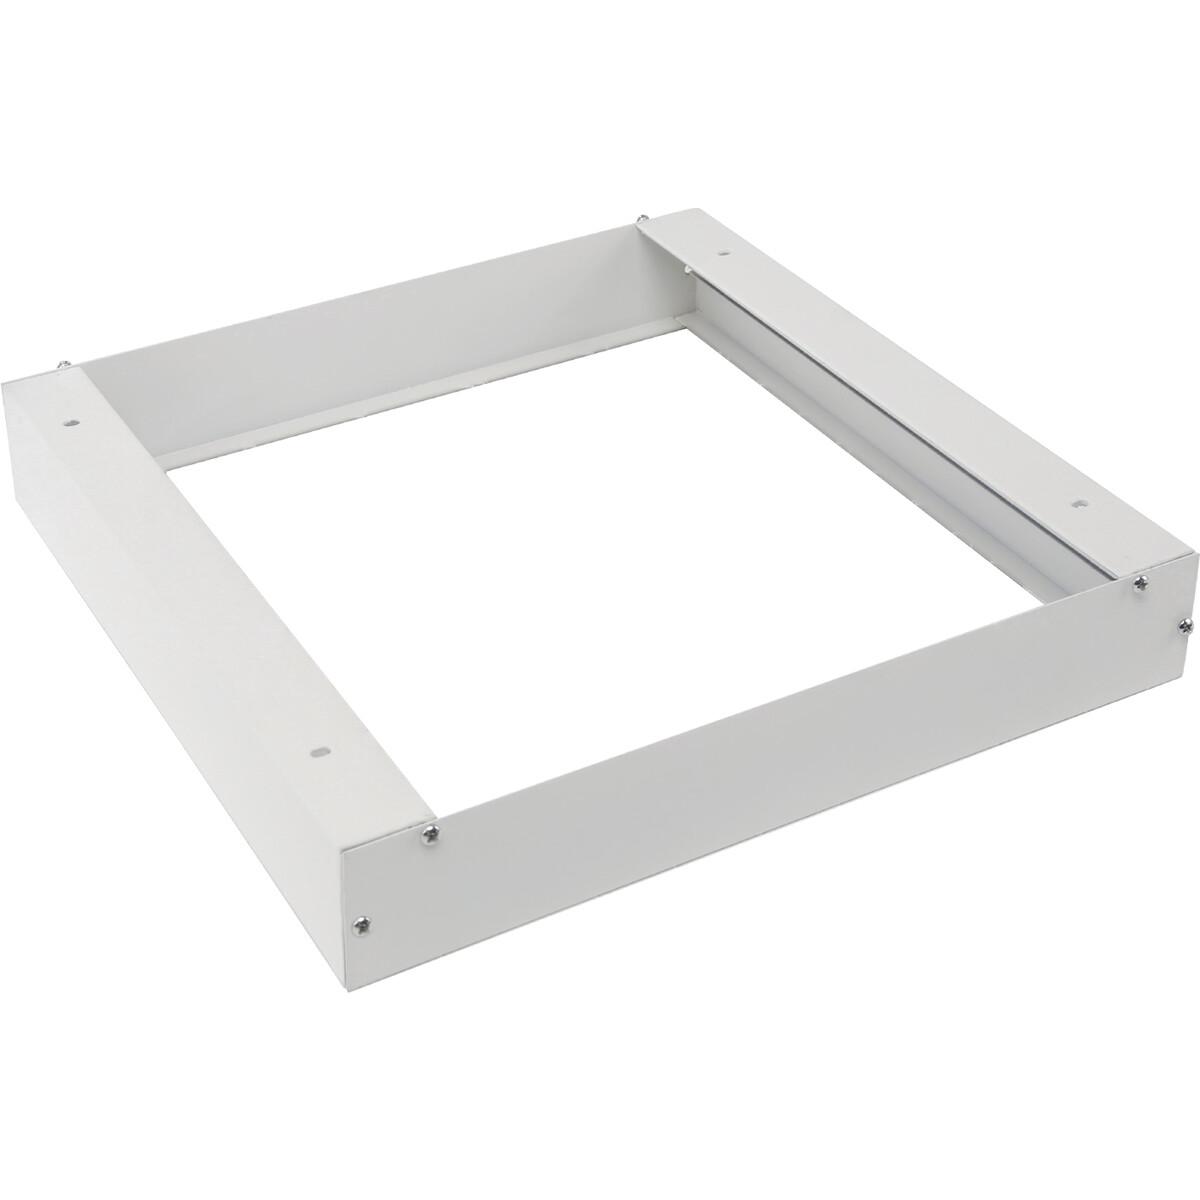 LED Paneel 30x30 - Aigi - Opbouw Frame - Aluminium - Wit